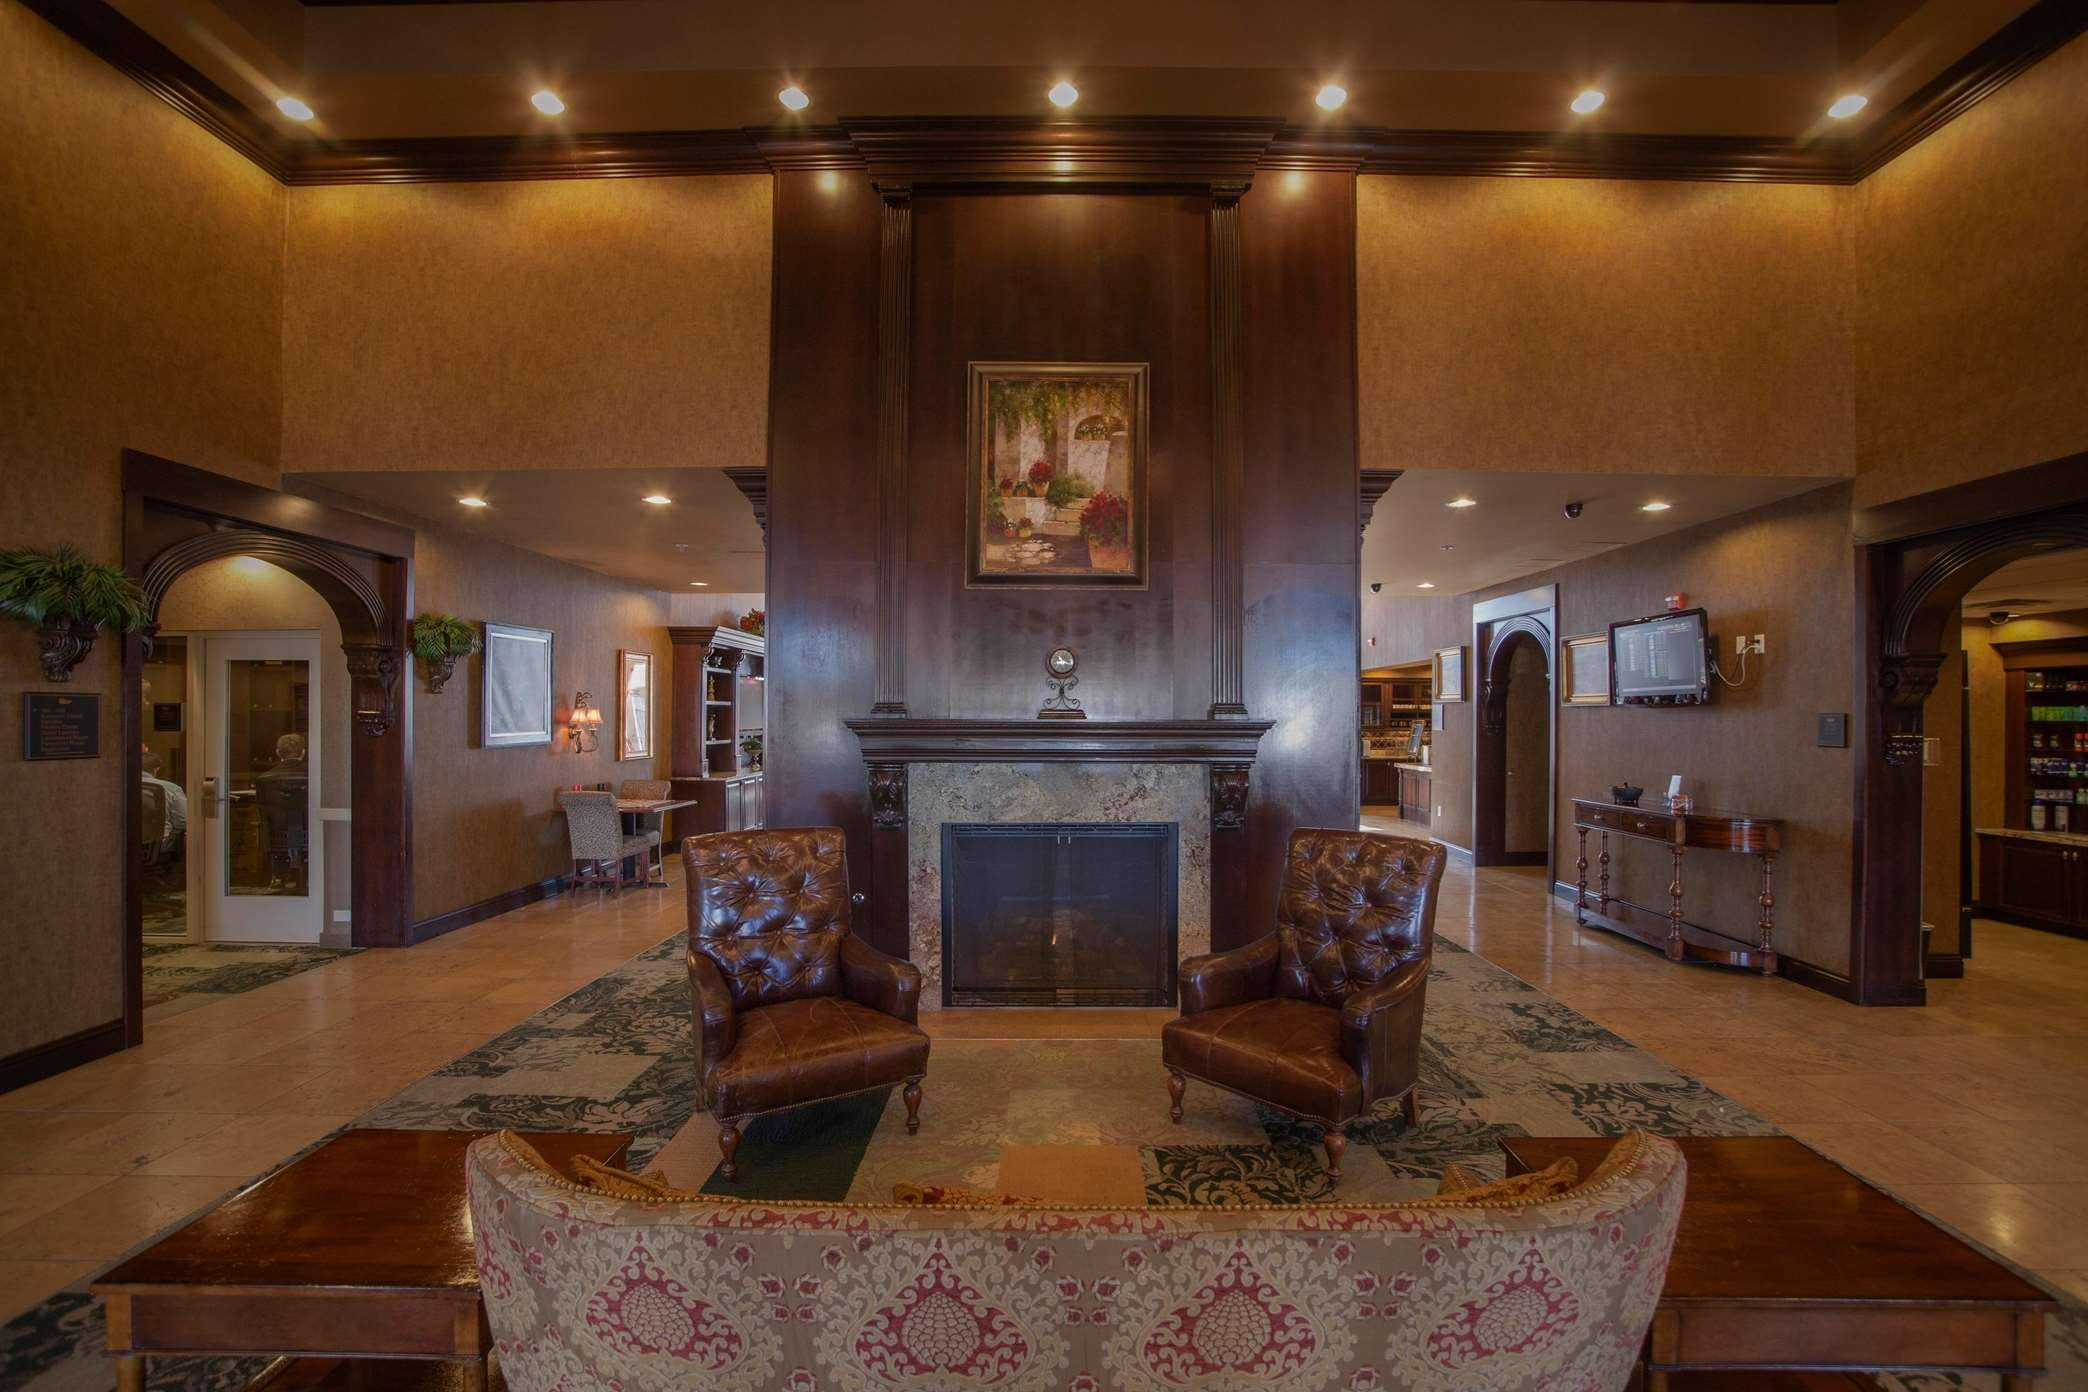 Homewood Suites by Hilton Albuquerque Airport image 15